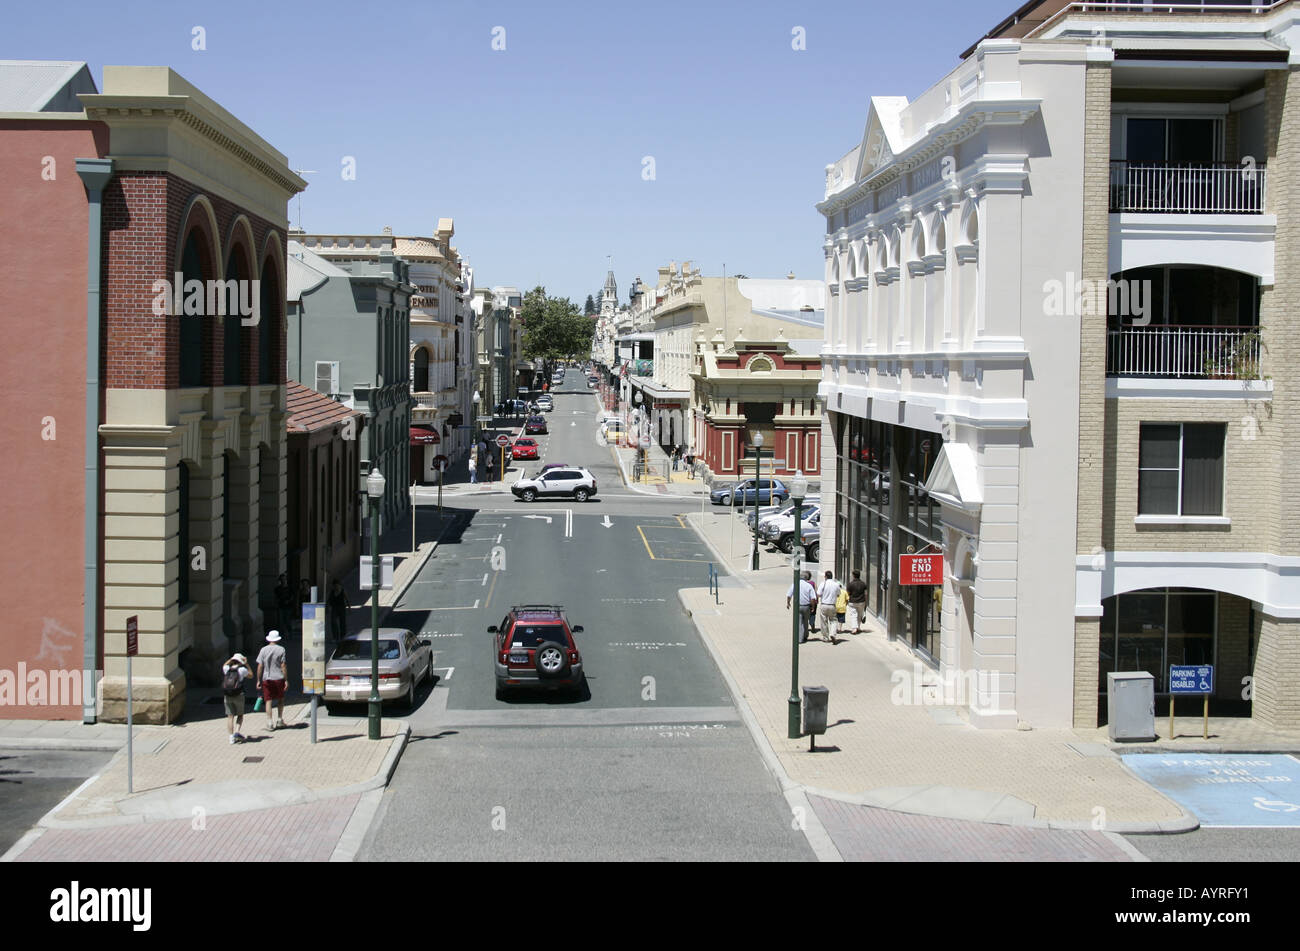 Looking down Fremantle High Street. - Stock Image